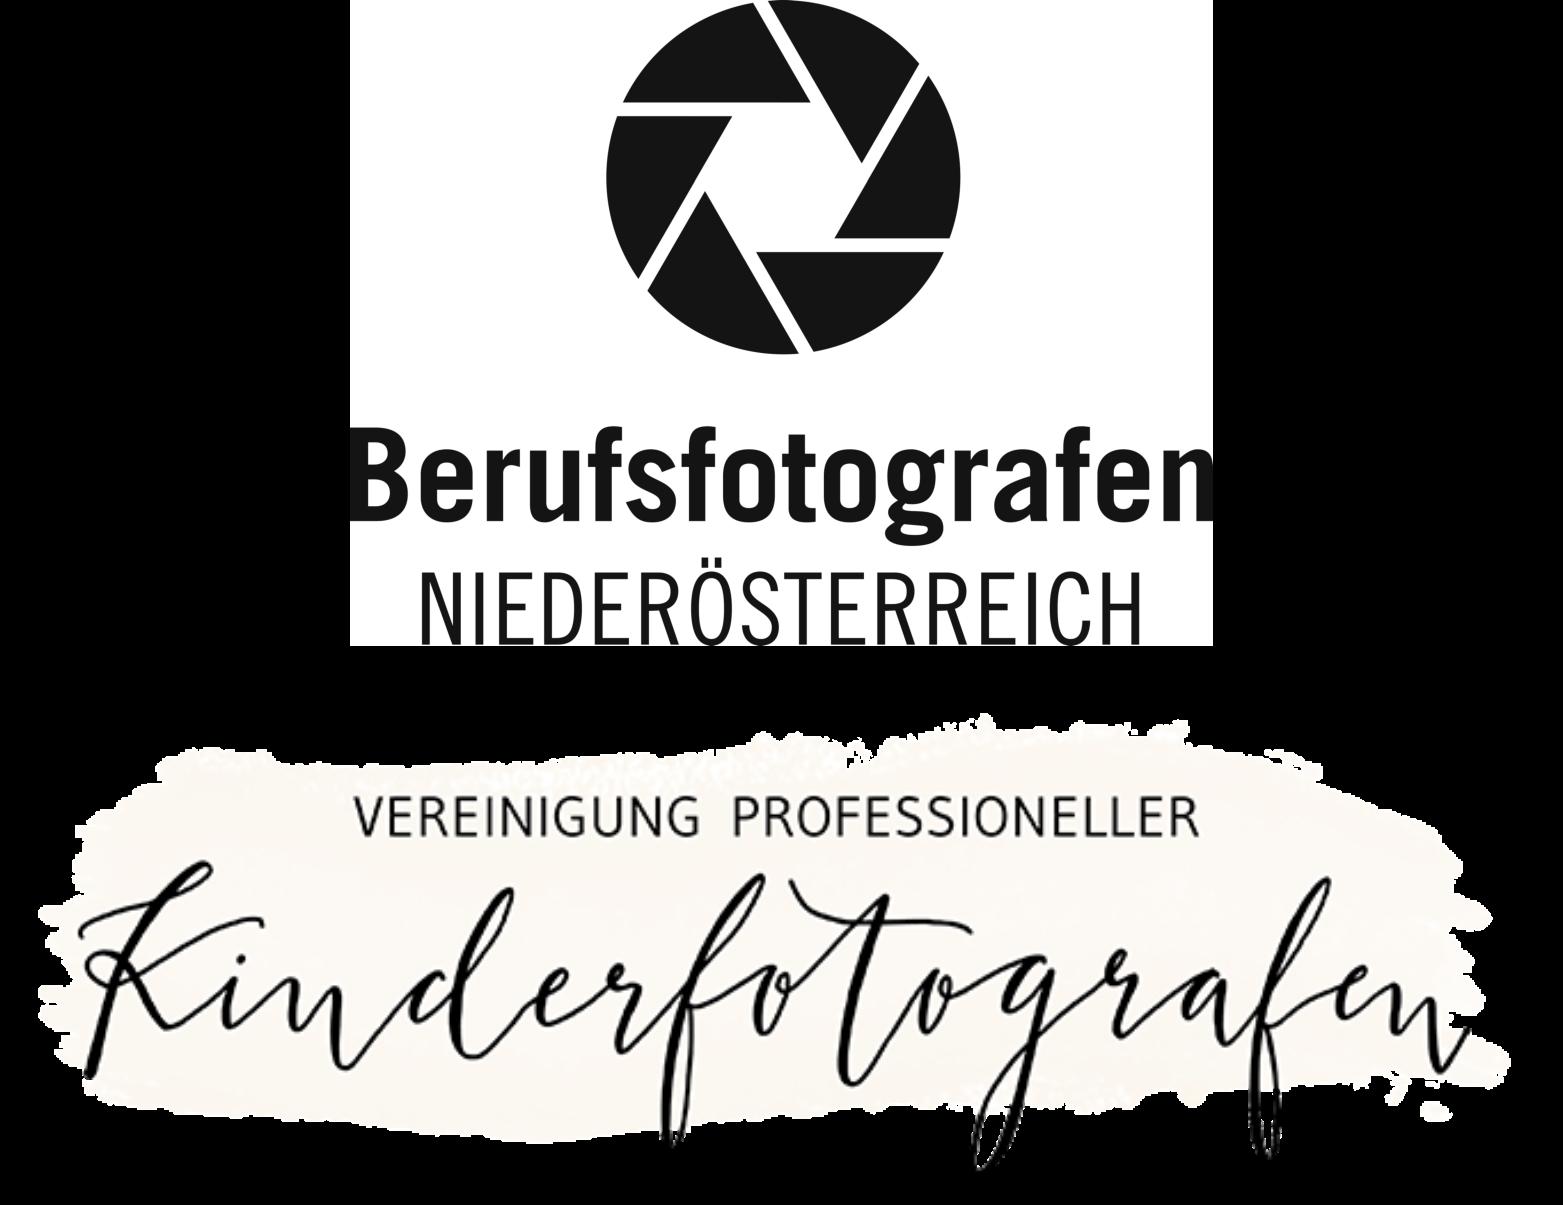 Andrea Kirchmaier Photographie Neugeborene Babybauch Kinder